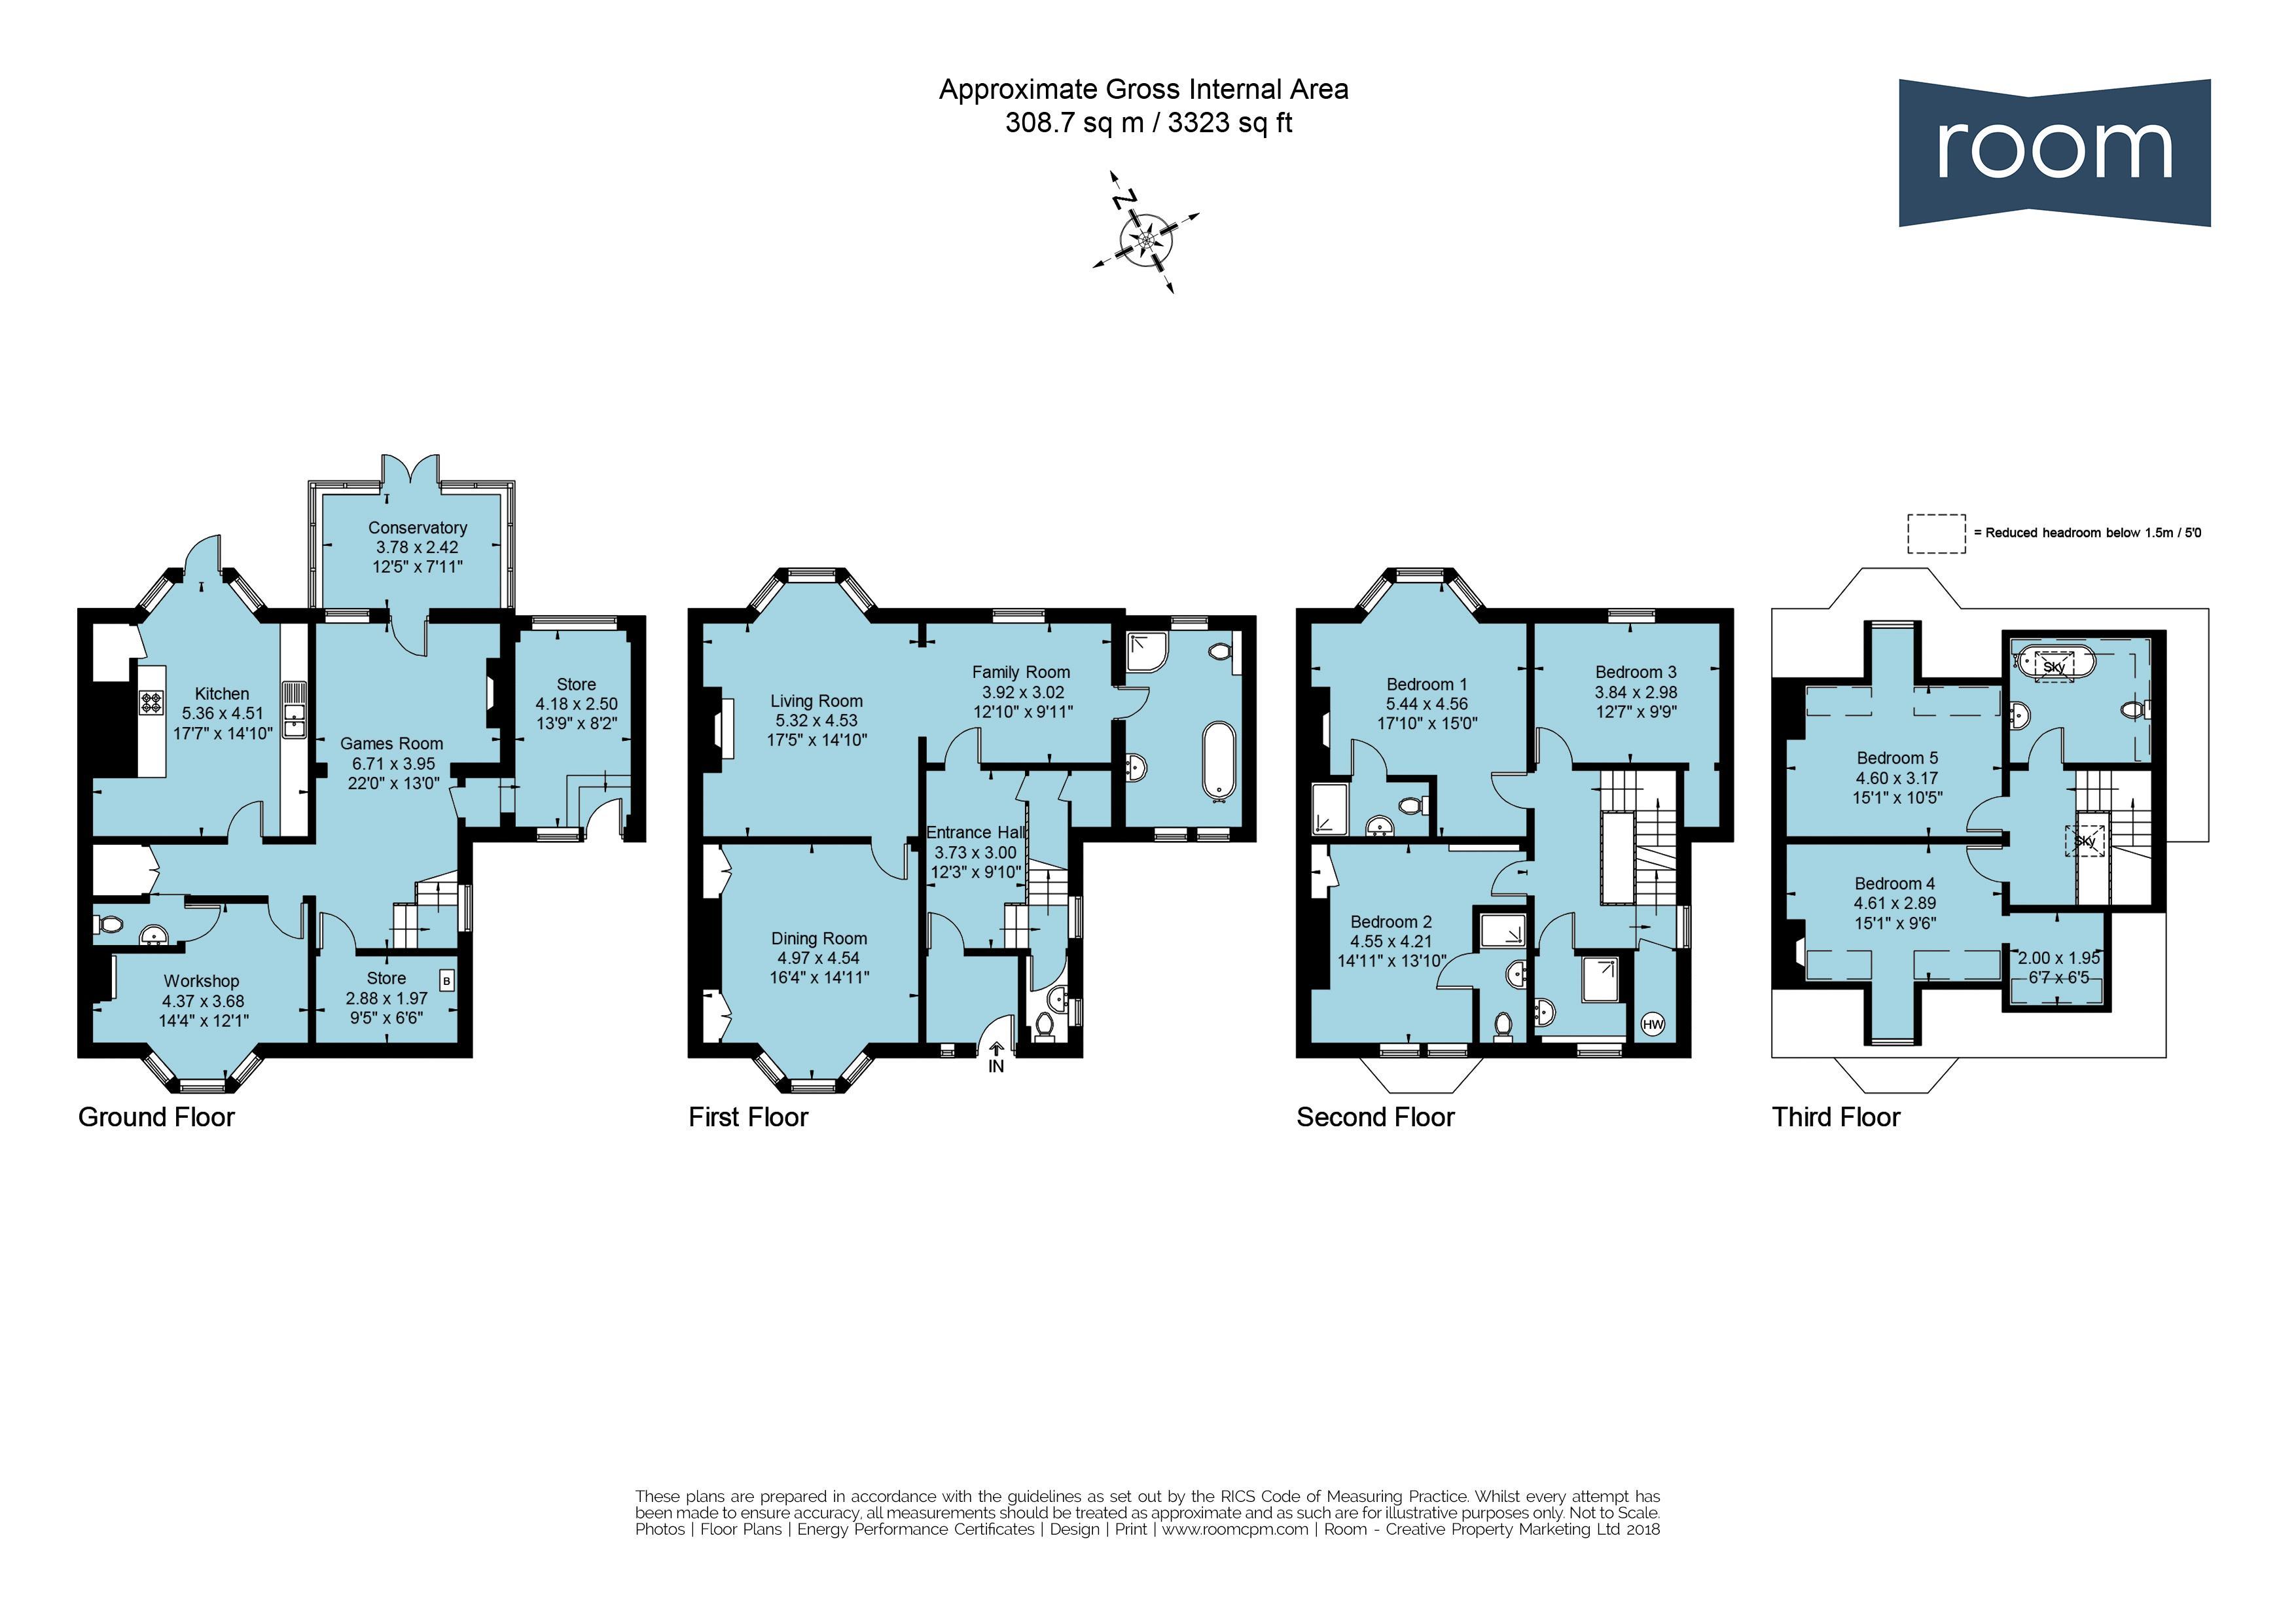 10UOP - Floorplan